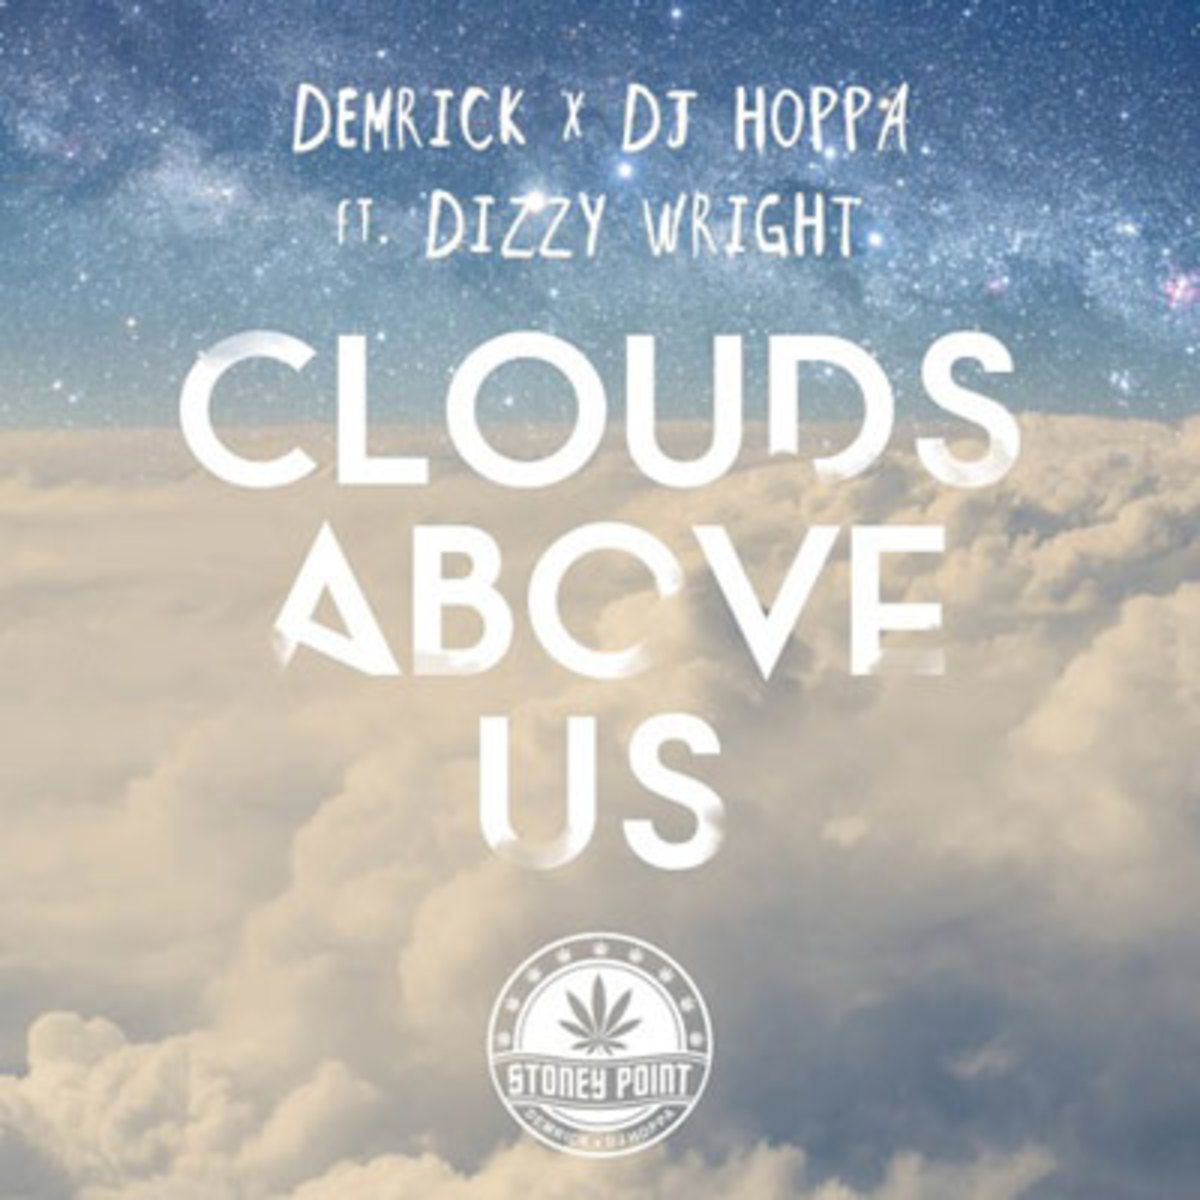 demrick-clouds-above-us.jpg